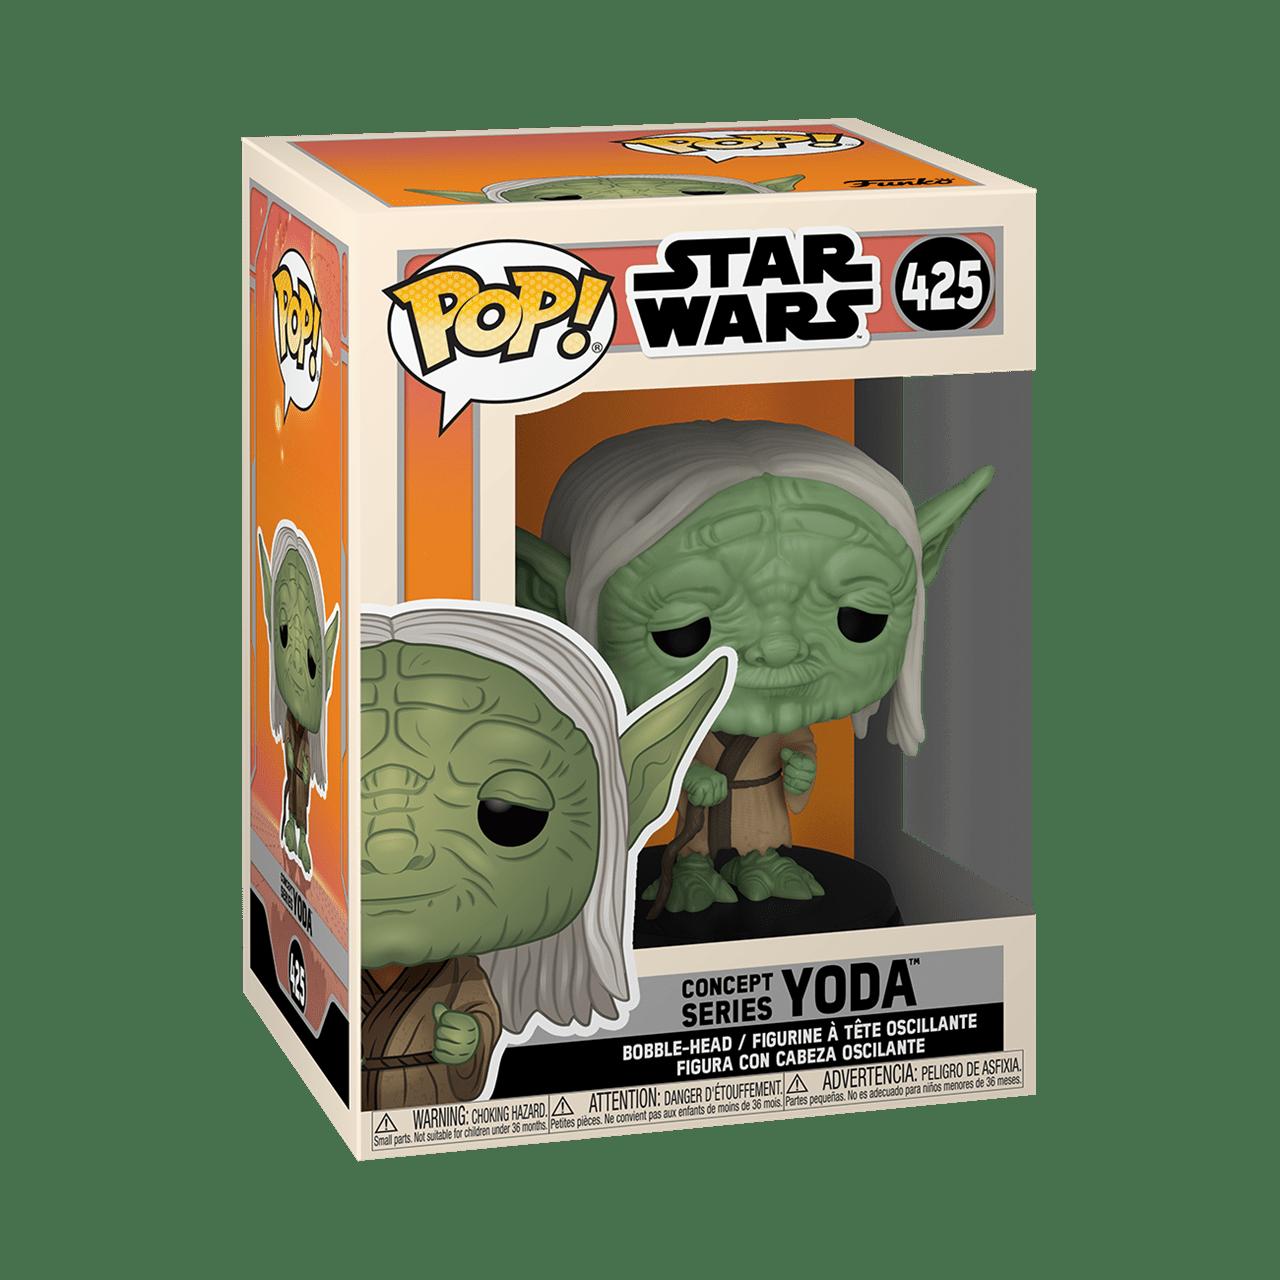 Star Wars Concept Series: Yoda (425) Pop Vinyl - 2